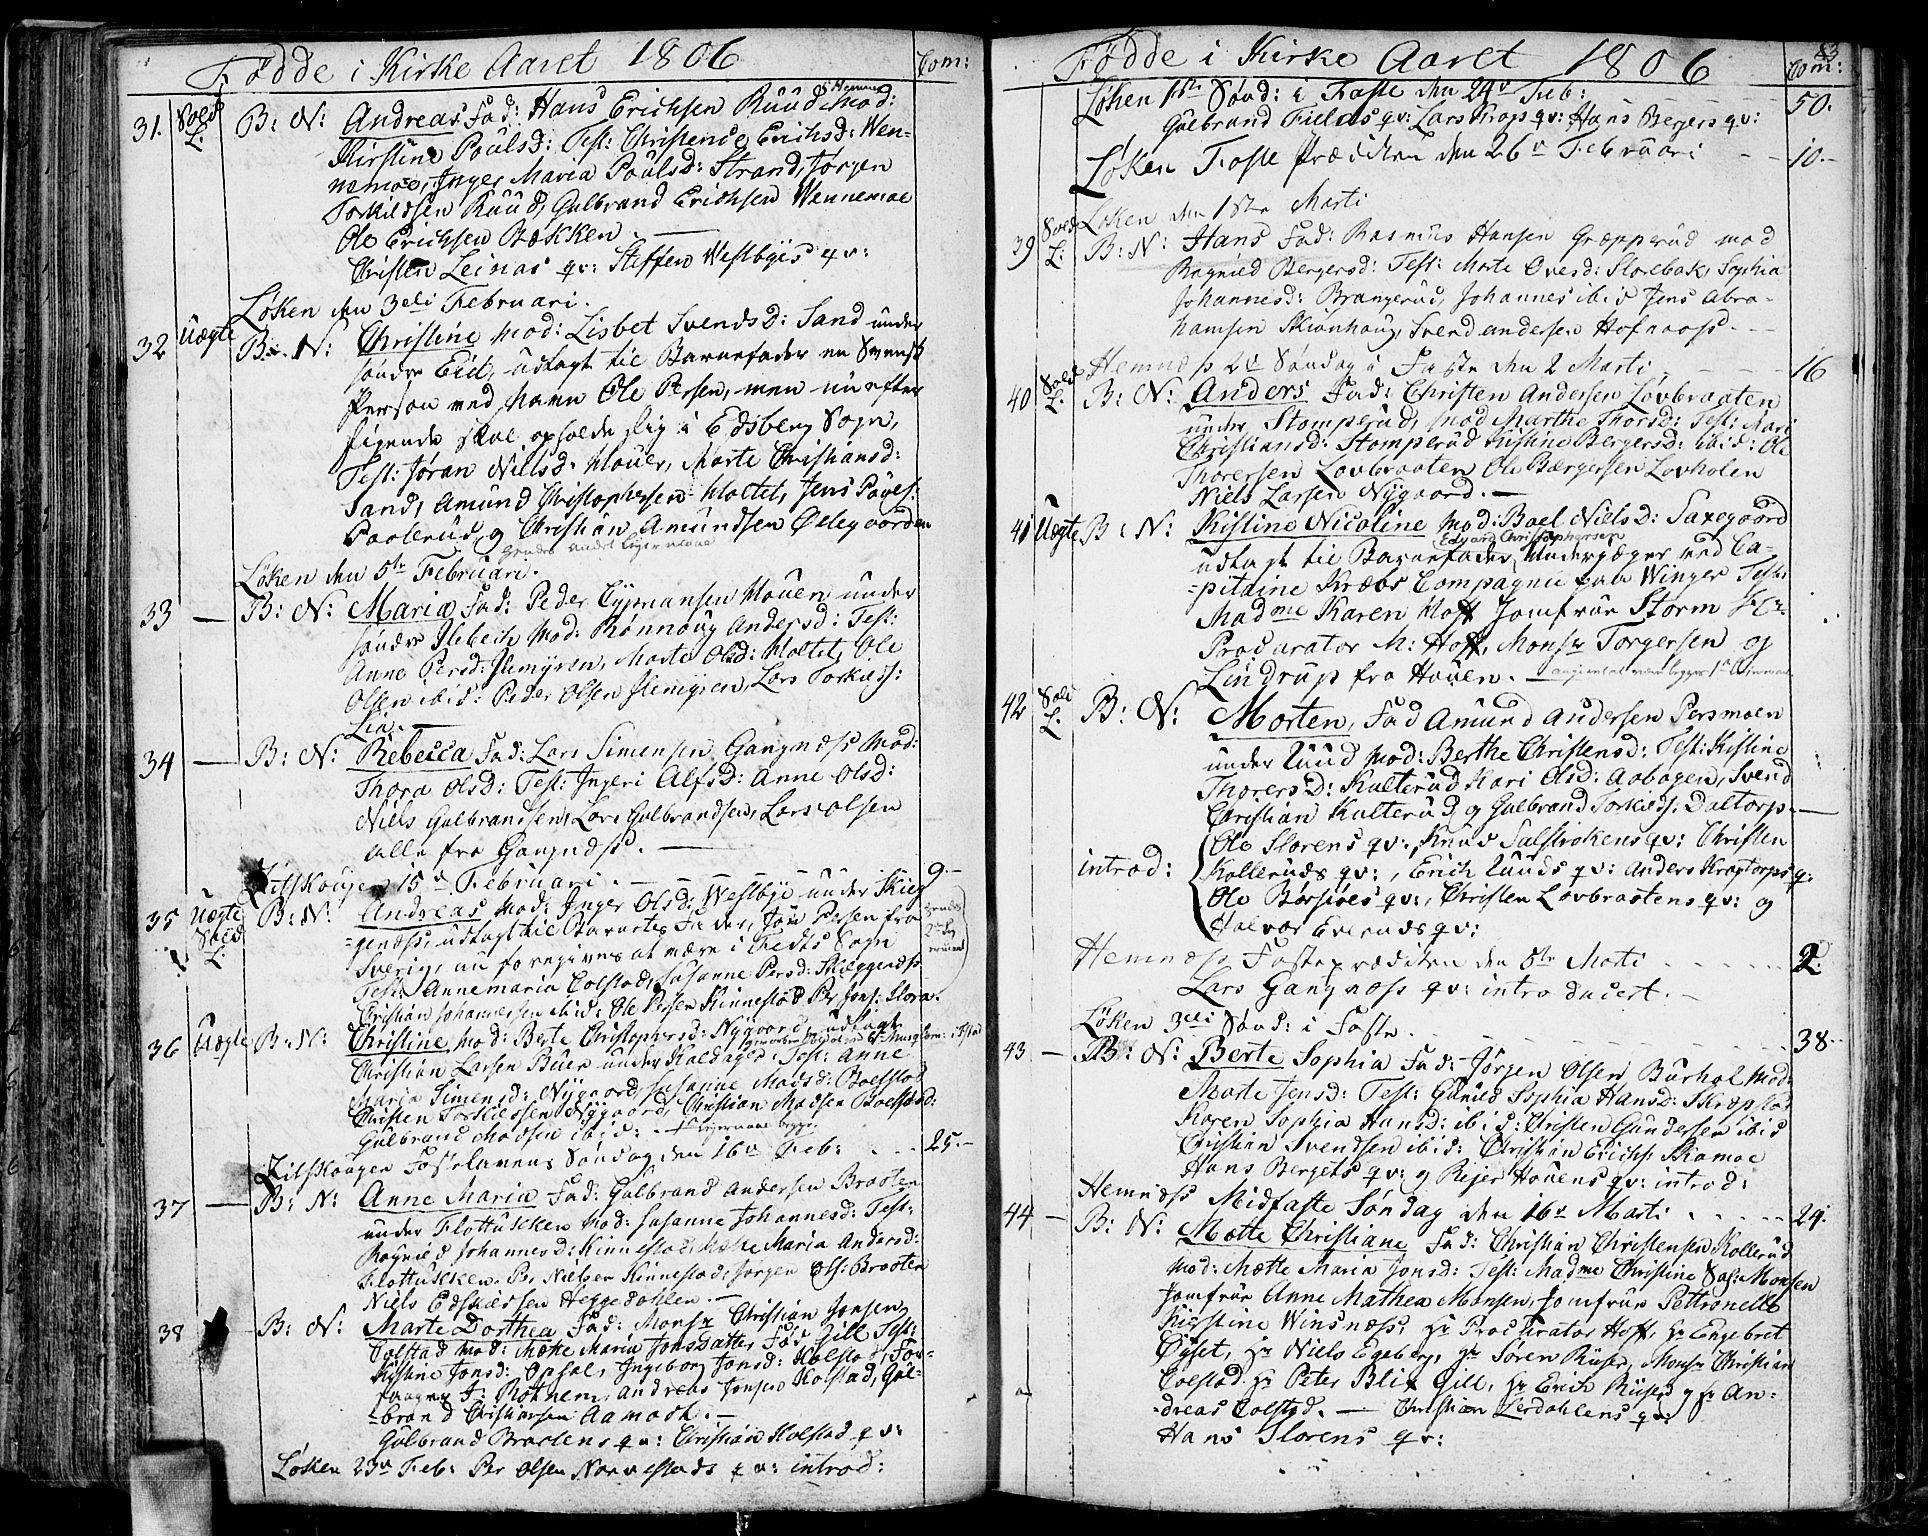 SAO, Høland prestekontor Kirkebøker, F/Fa/L0006: Ministerialbok nr. I 6, 1794-1814, s. 83